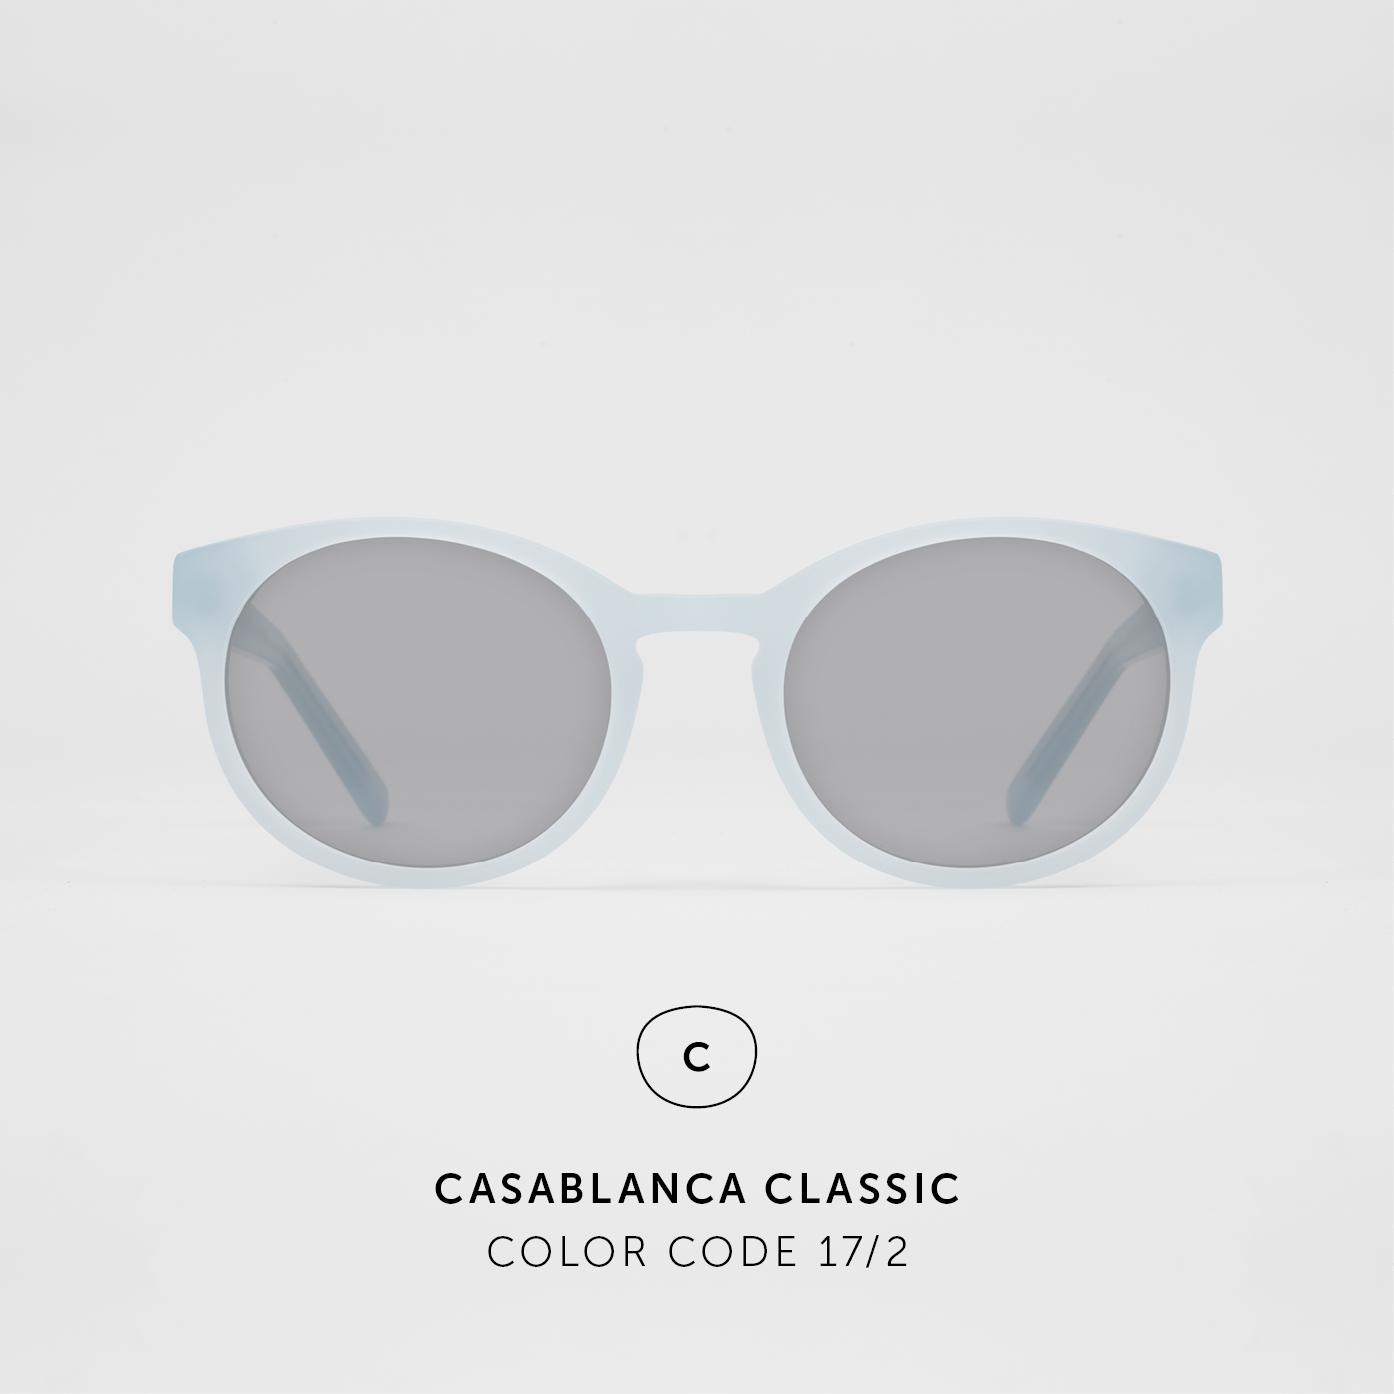 CasablancaClassic56.jpg